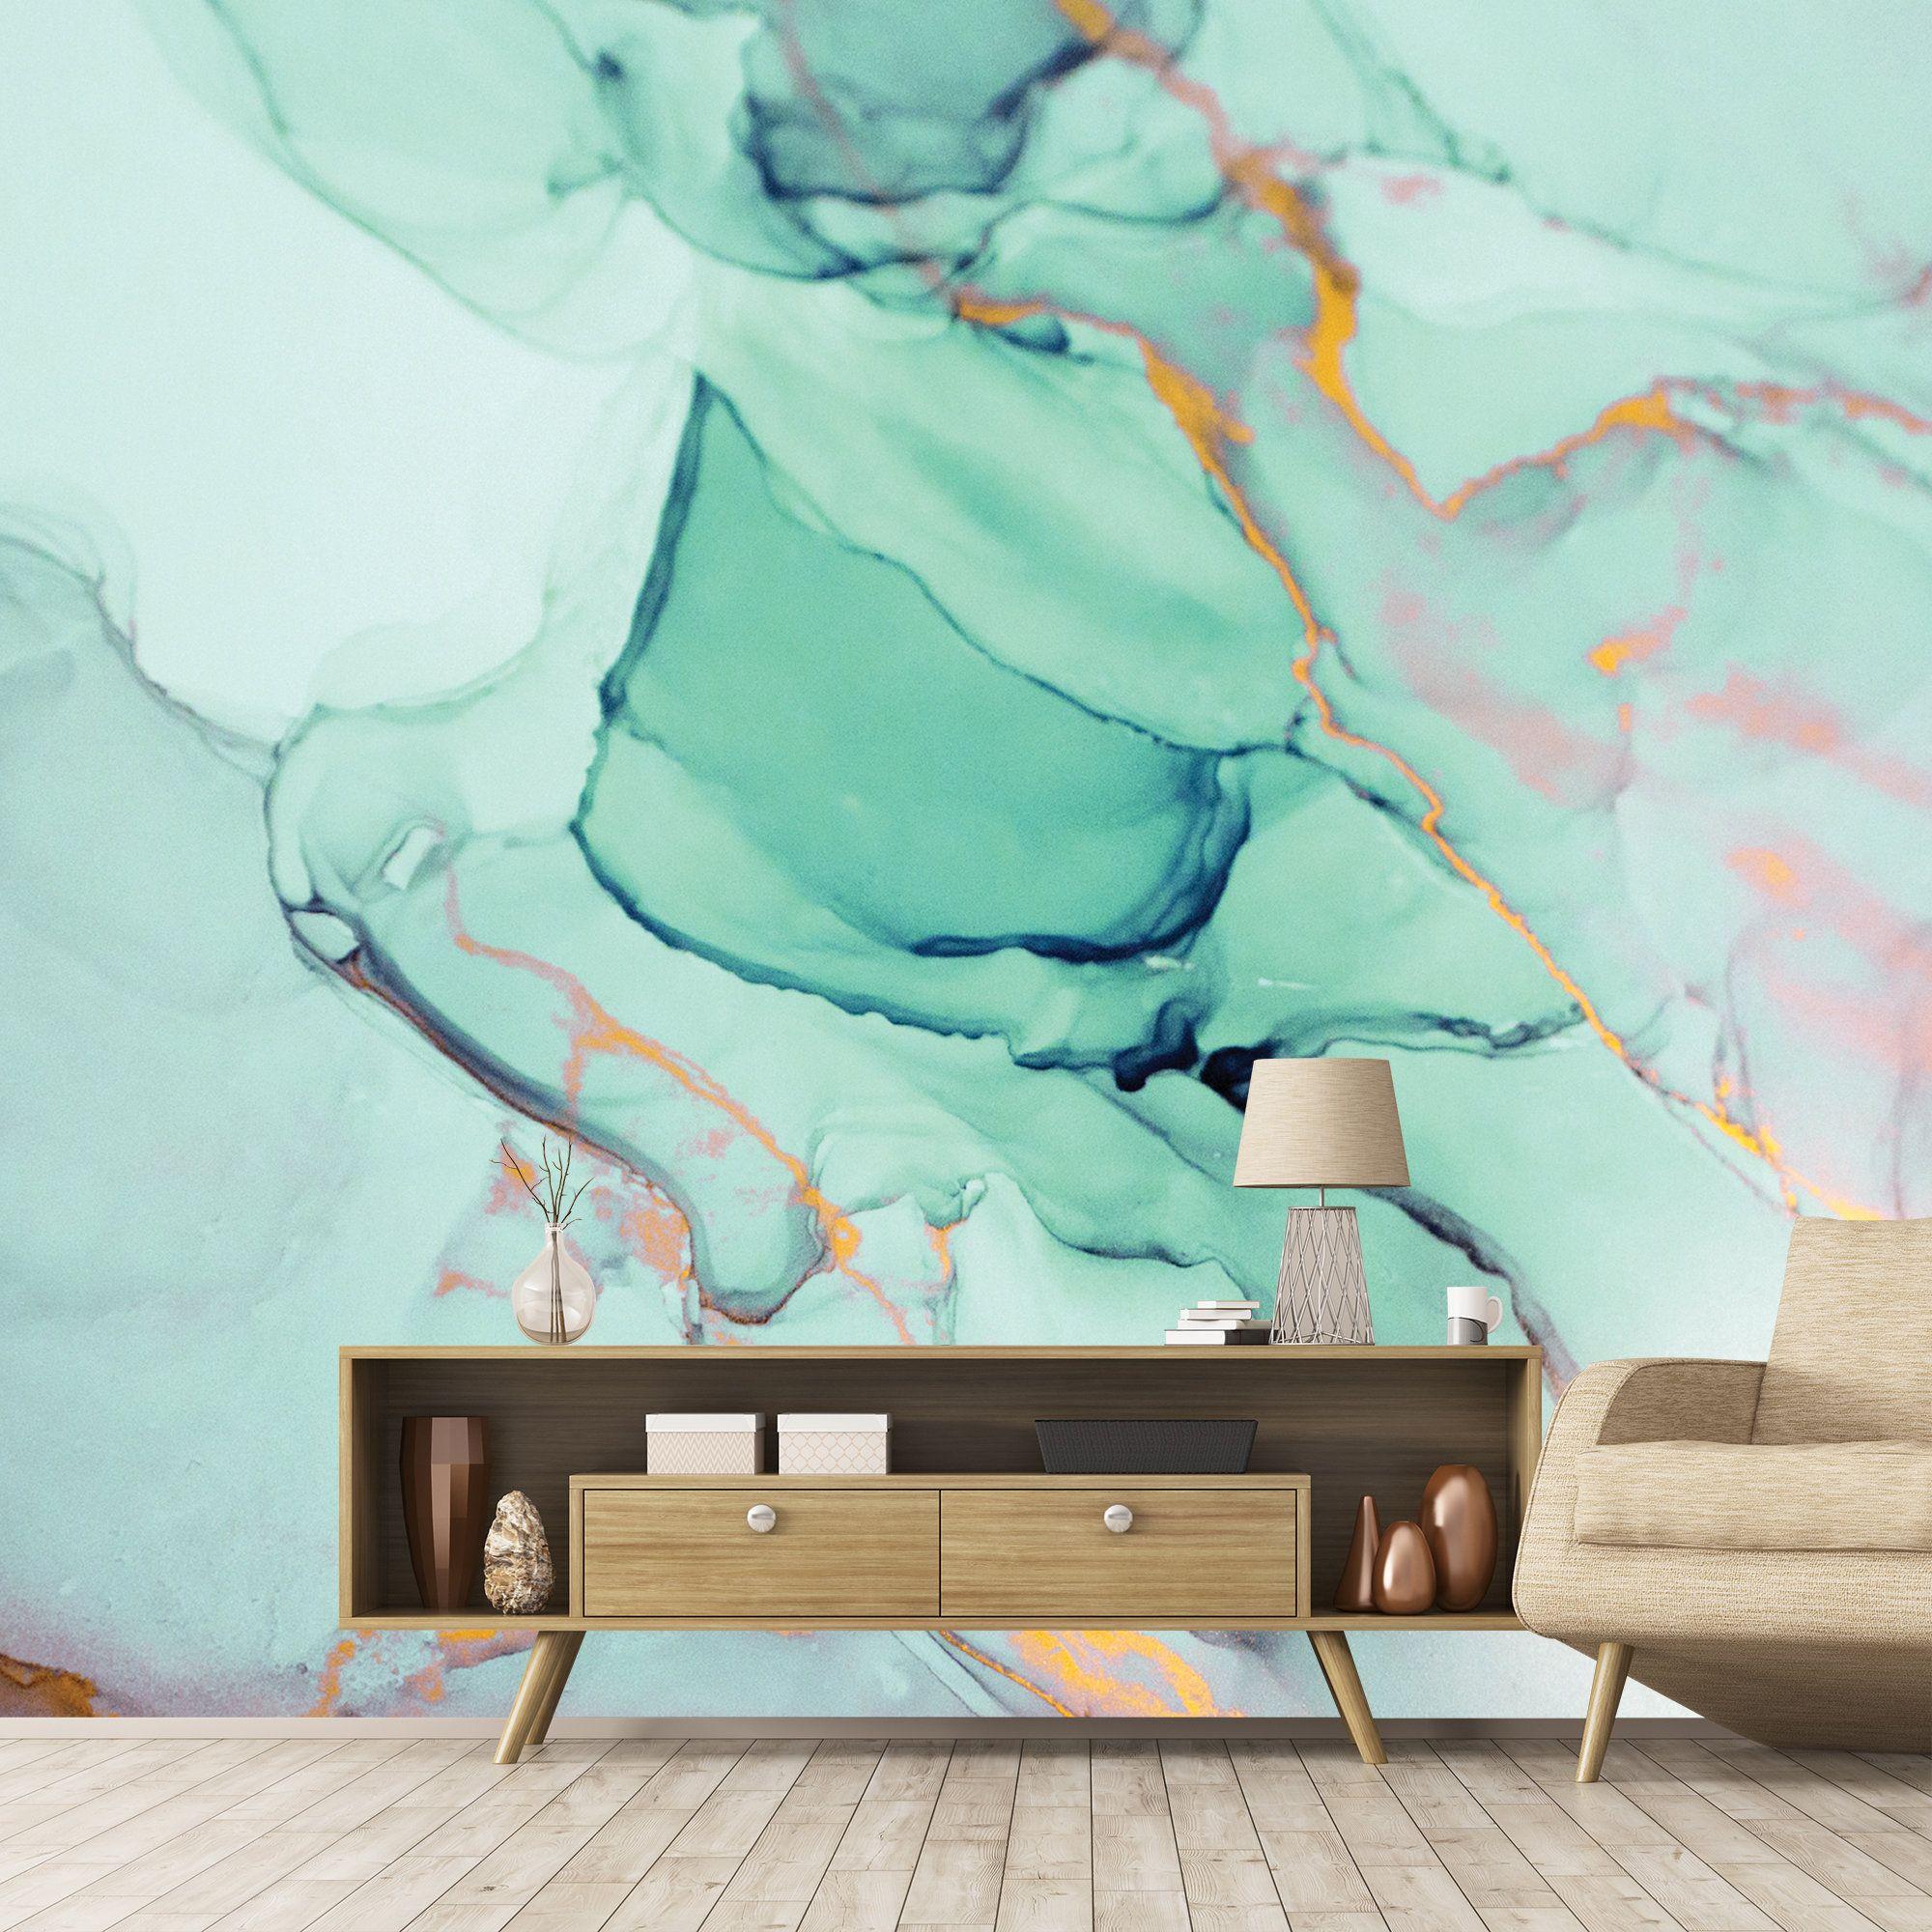 Green Marble Wallpapergreen Wallpaper Removable Marble Etsy Removable Wallpaper Wallpaper Walls Decor Custom Wallpaper